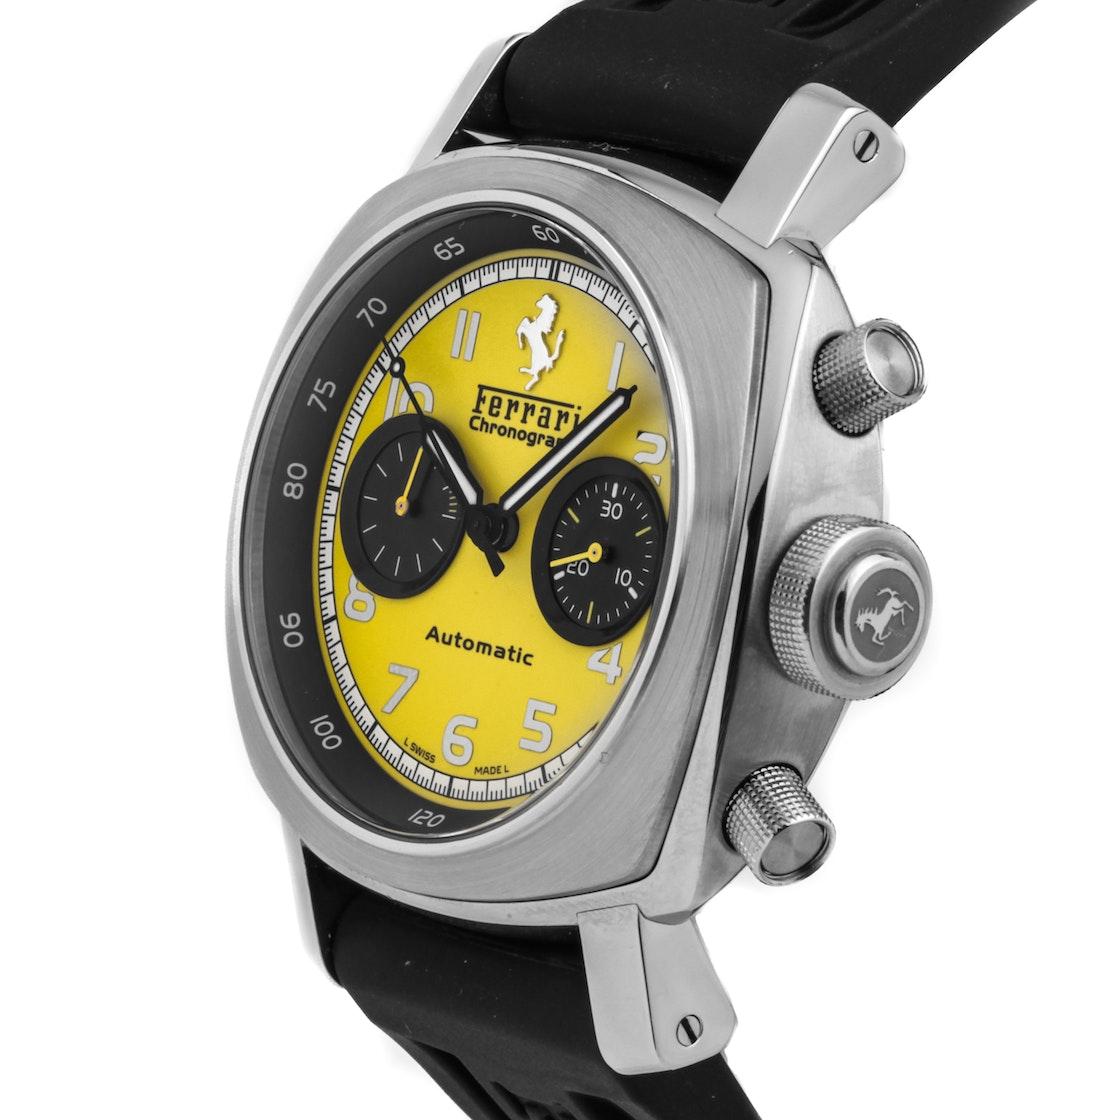 Panerai Ferrari Granturismo Chronograph Limited Edition FER 011